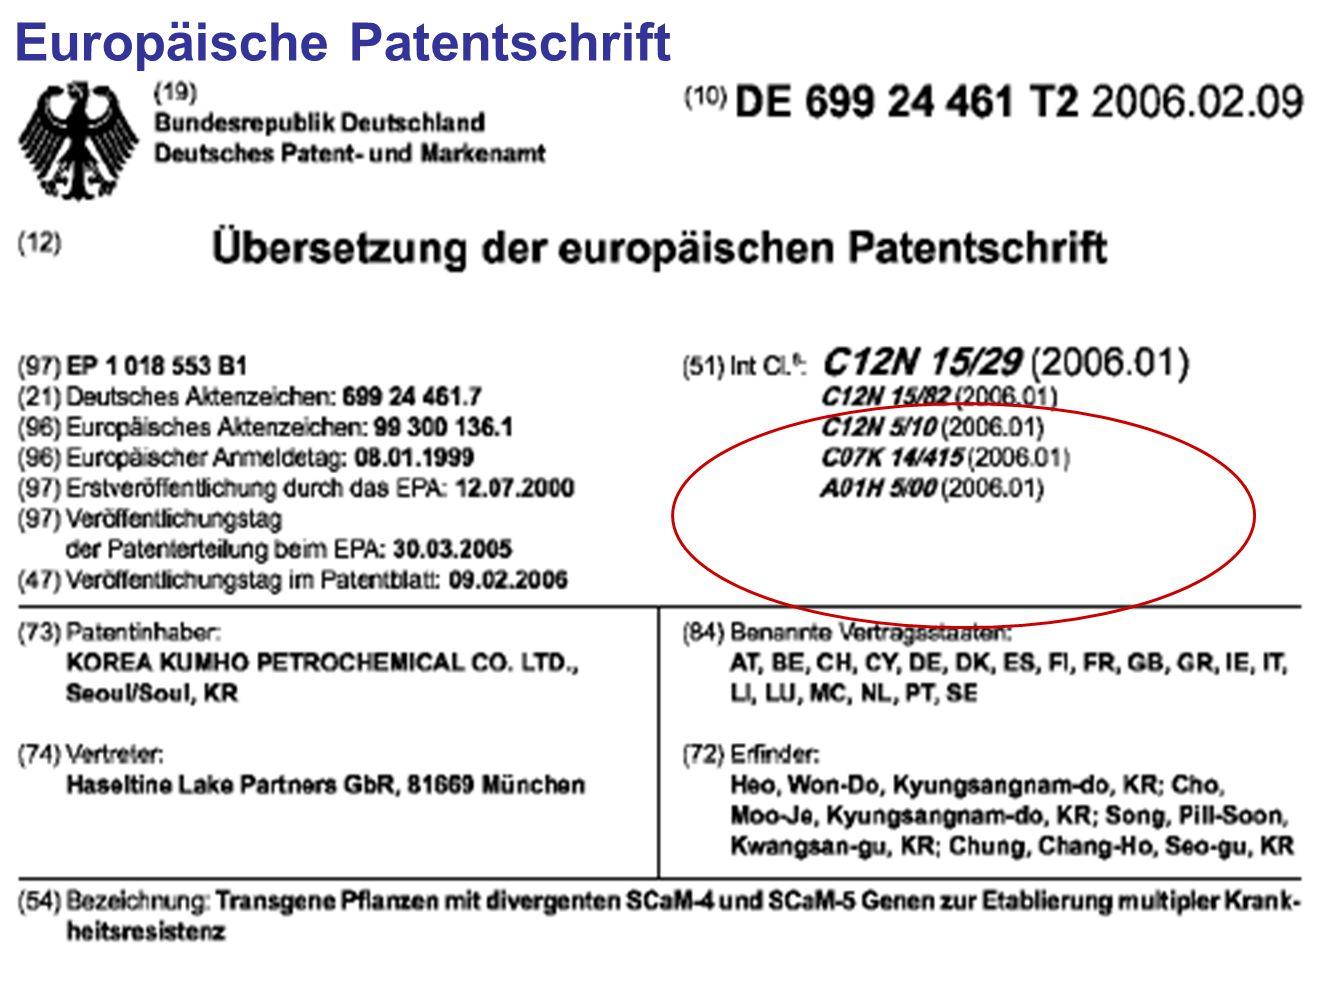 Europäische Patentschrift